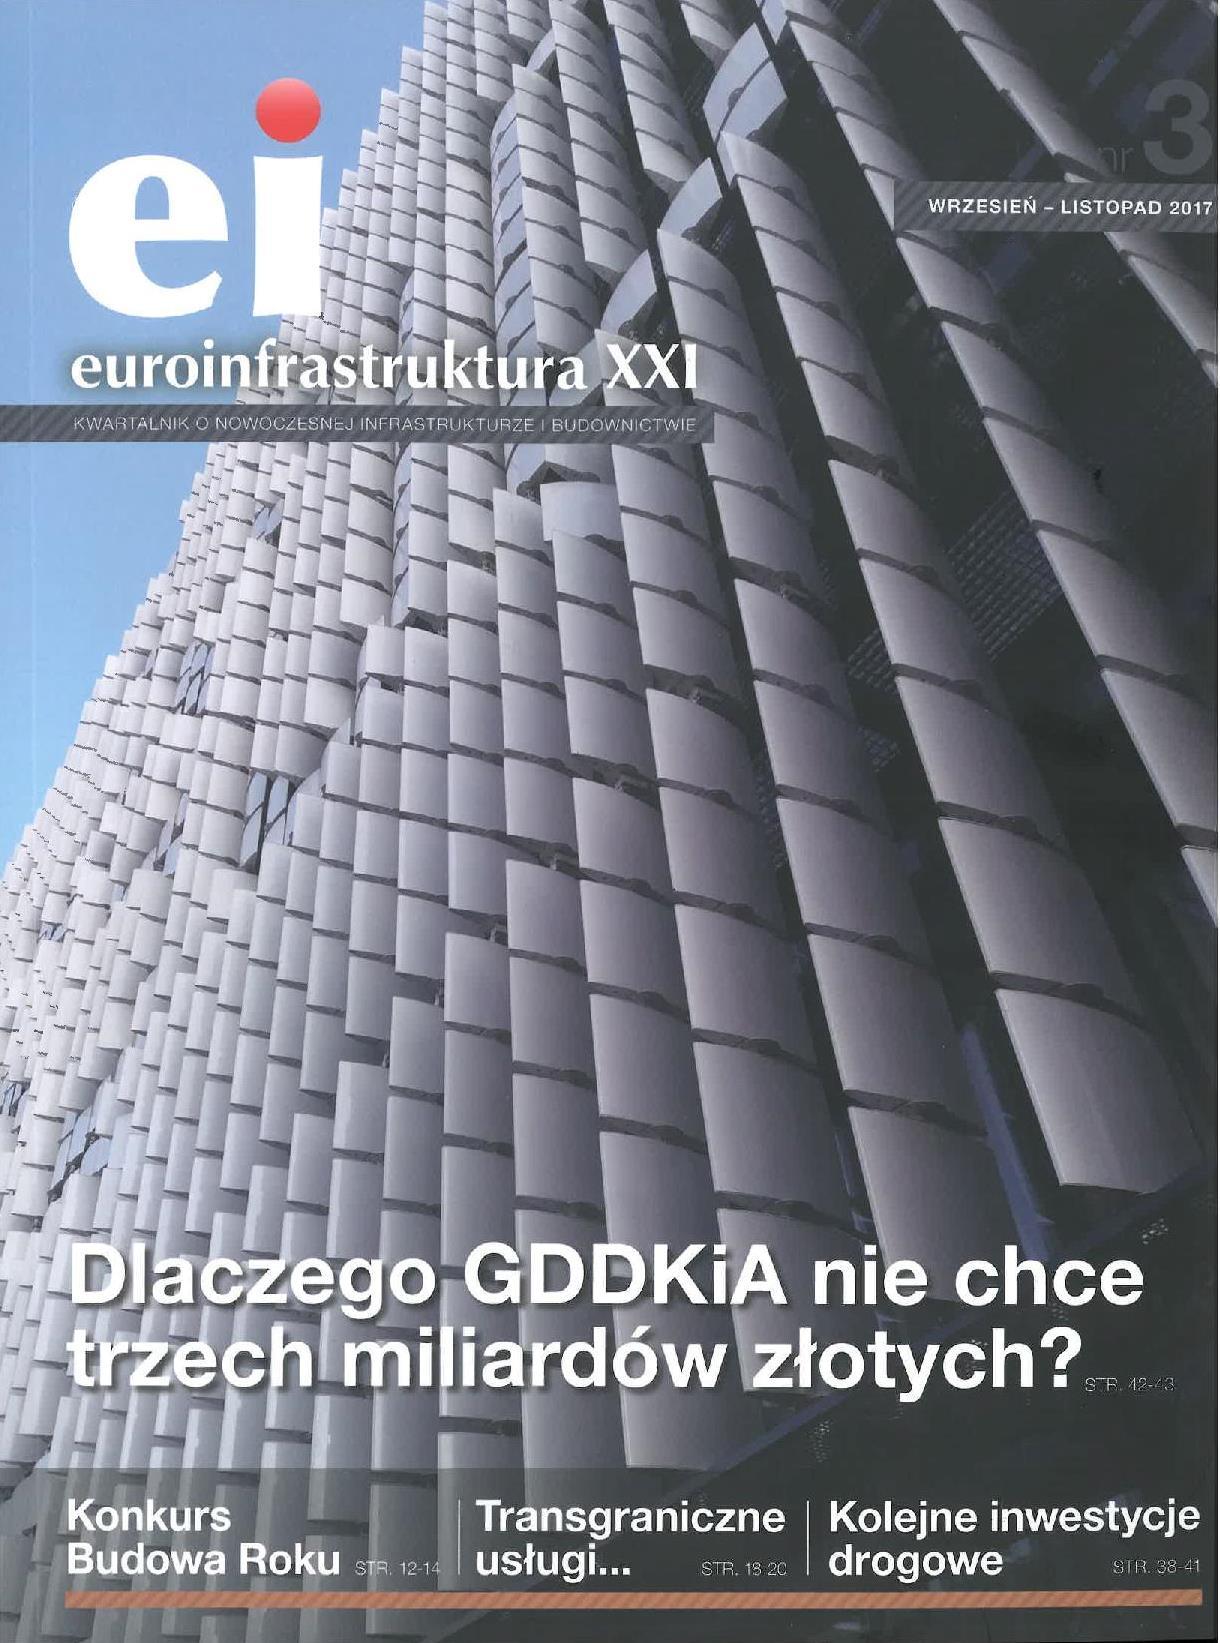 Euroinfrastruktura XXI